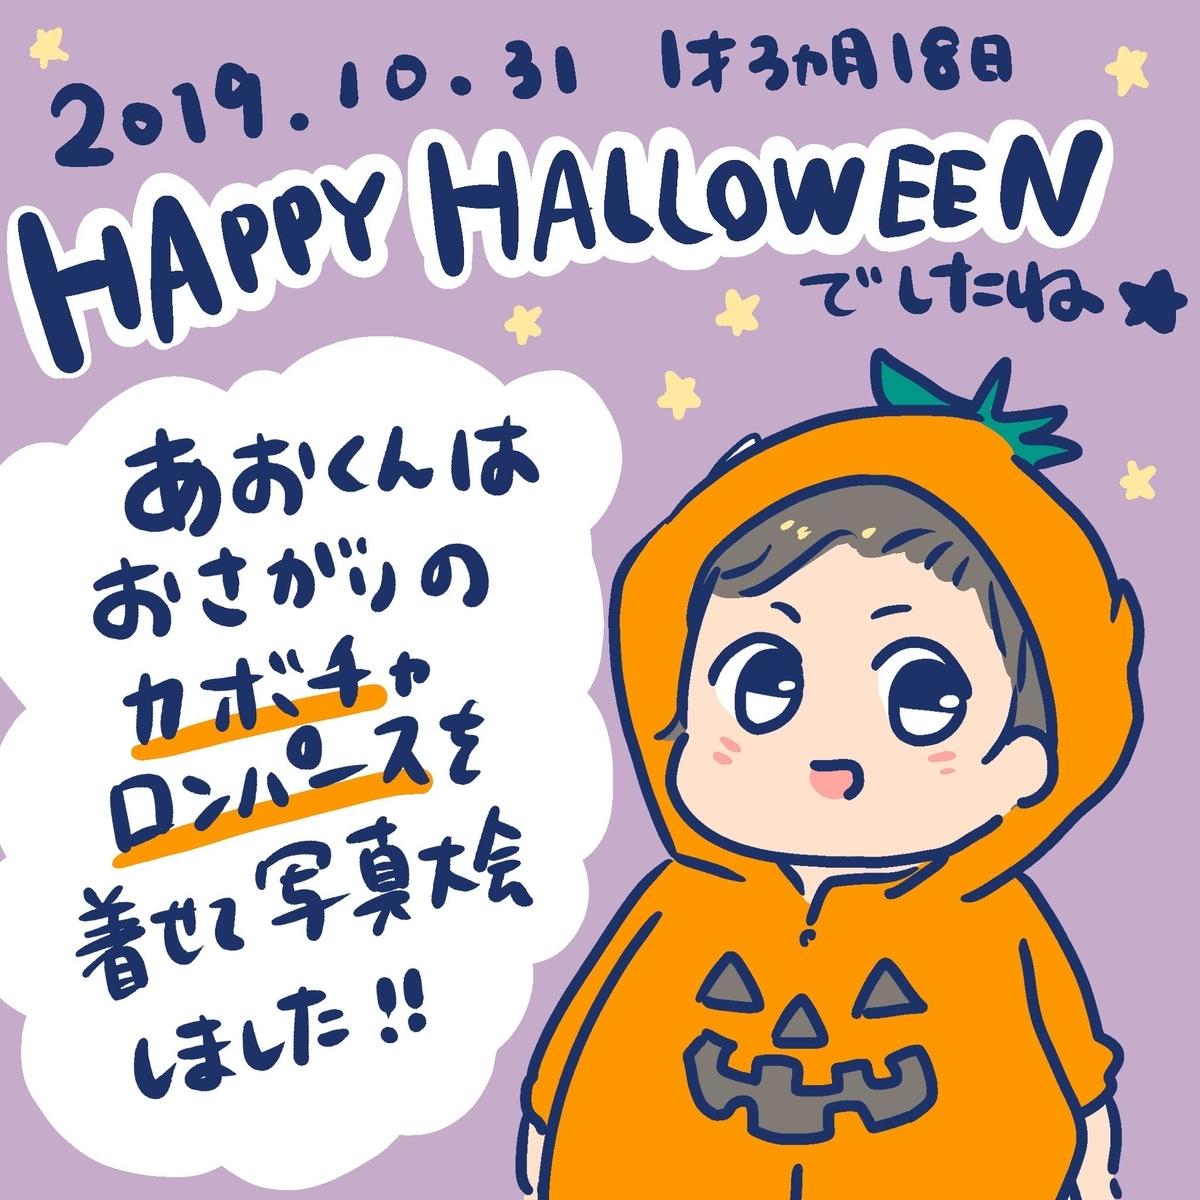 f:id:yantyakiroku:20191101102531j:plain